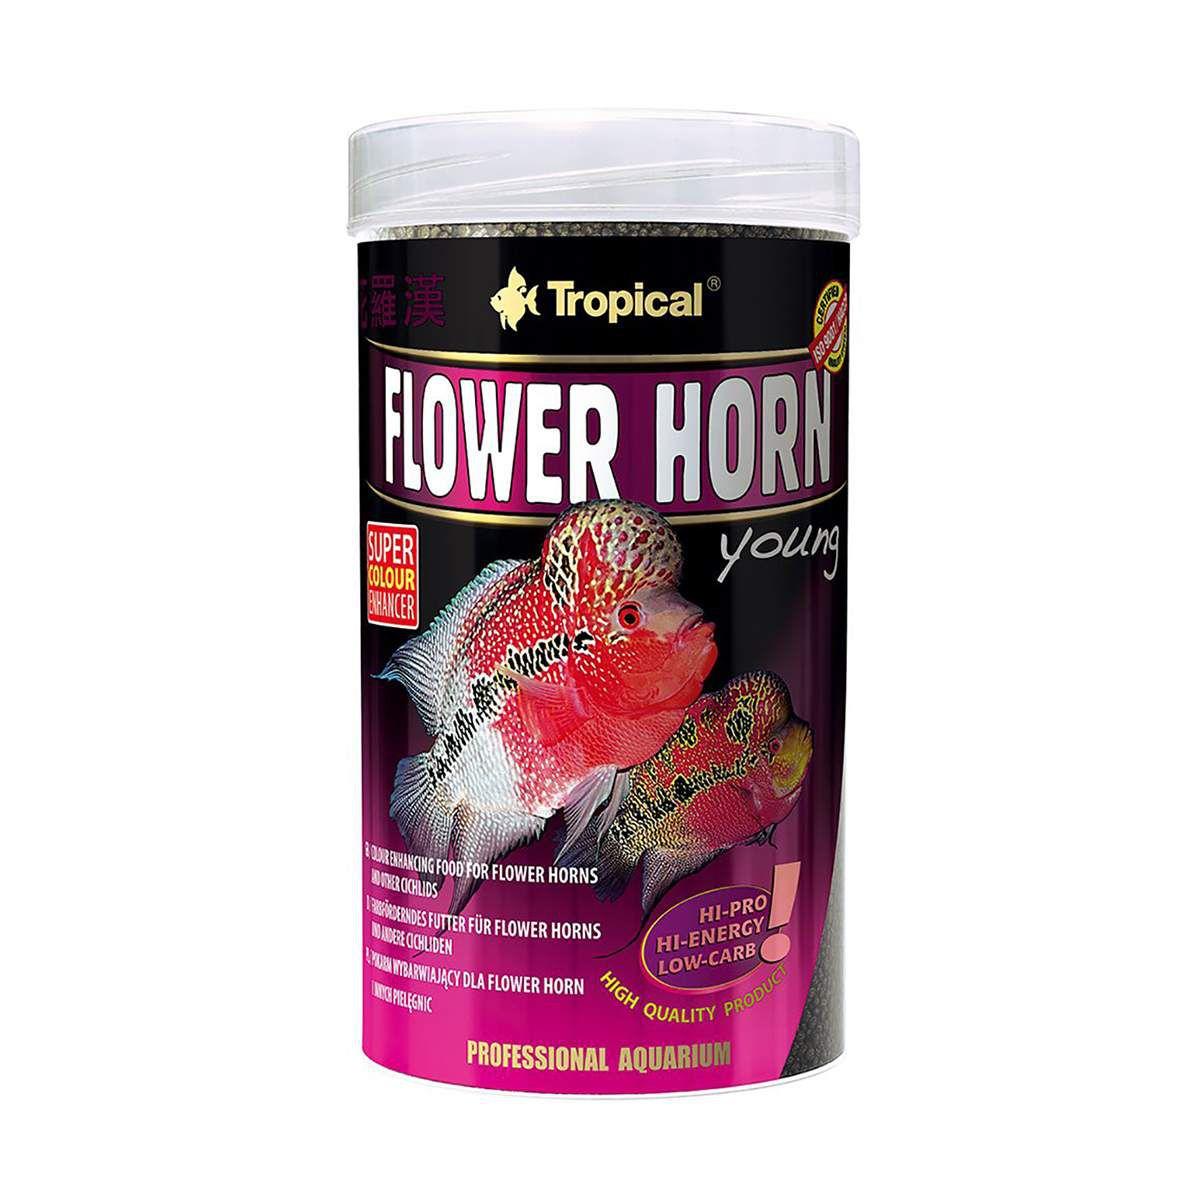 Tropical Flower Horn Adult Pellet 190g